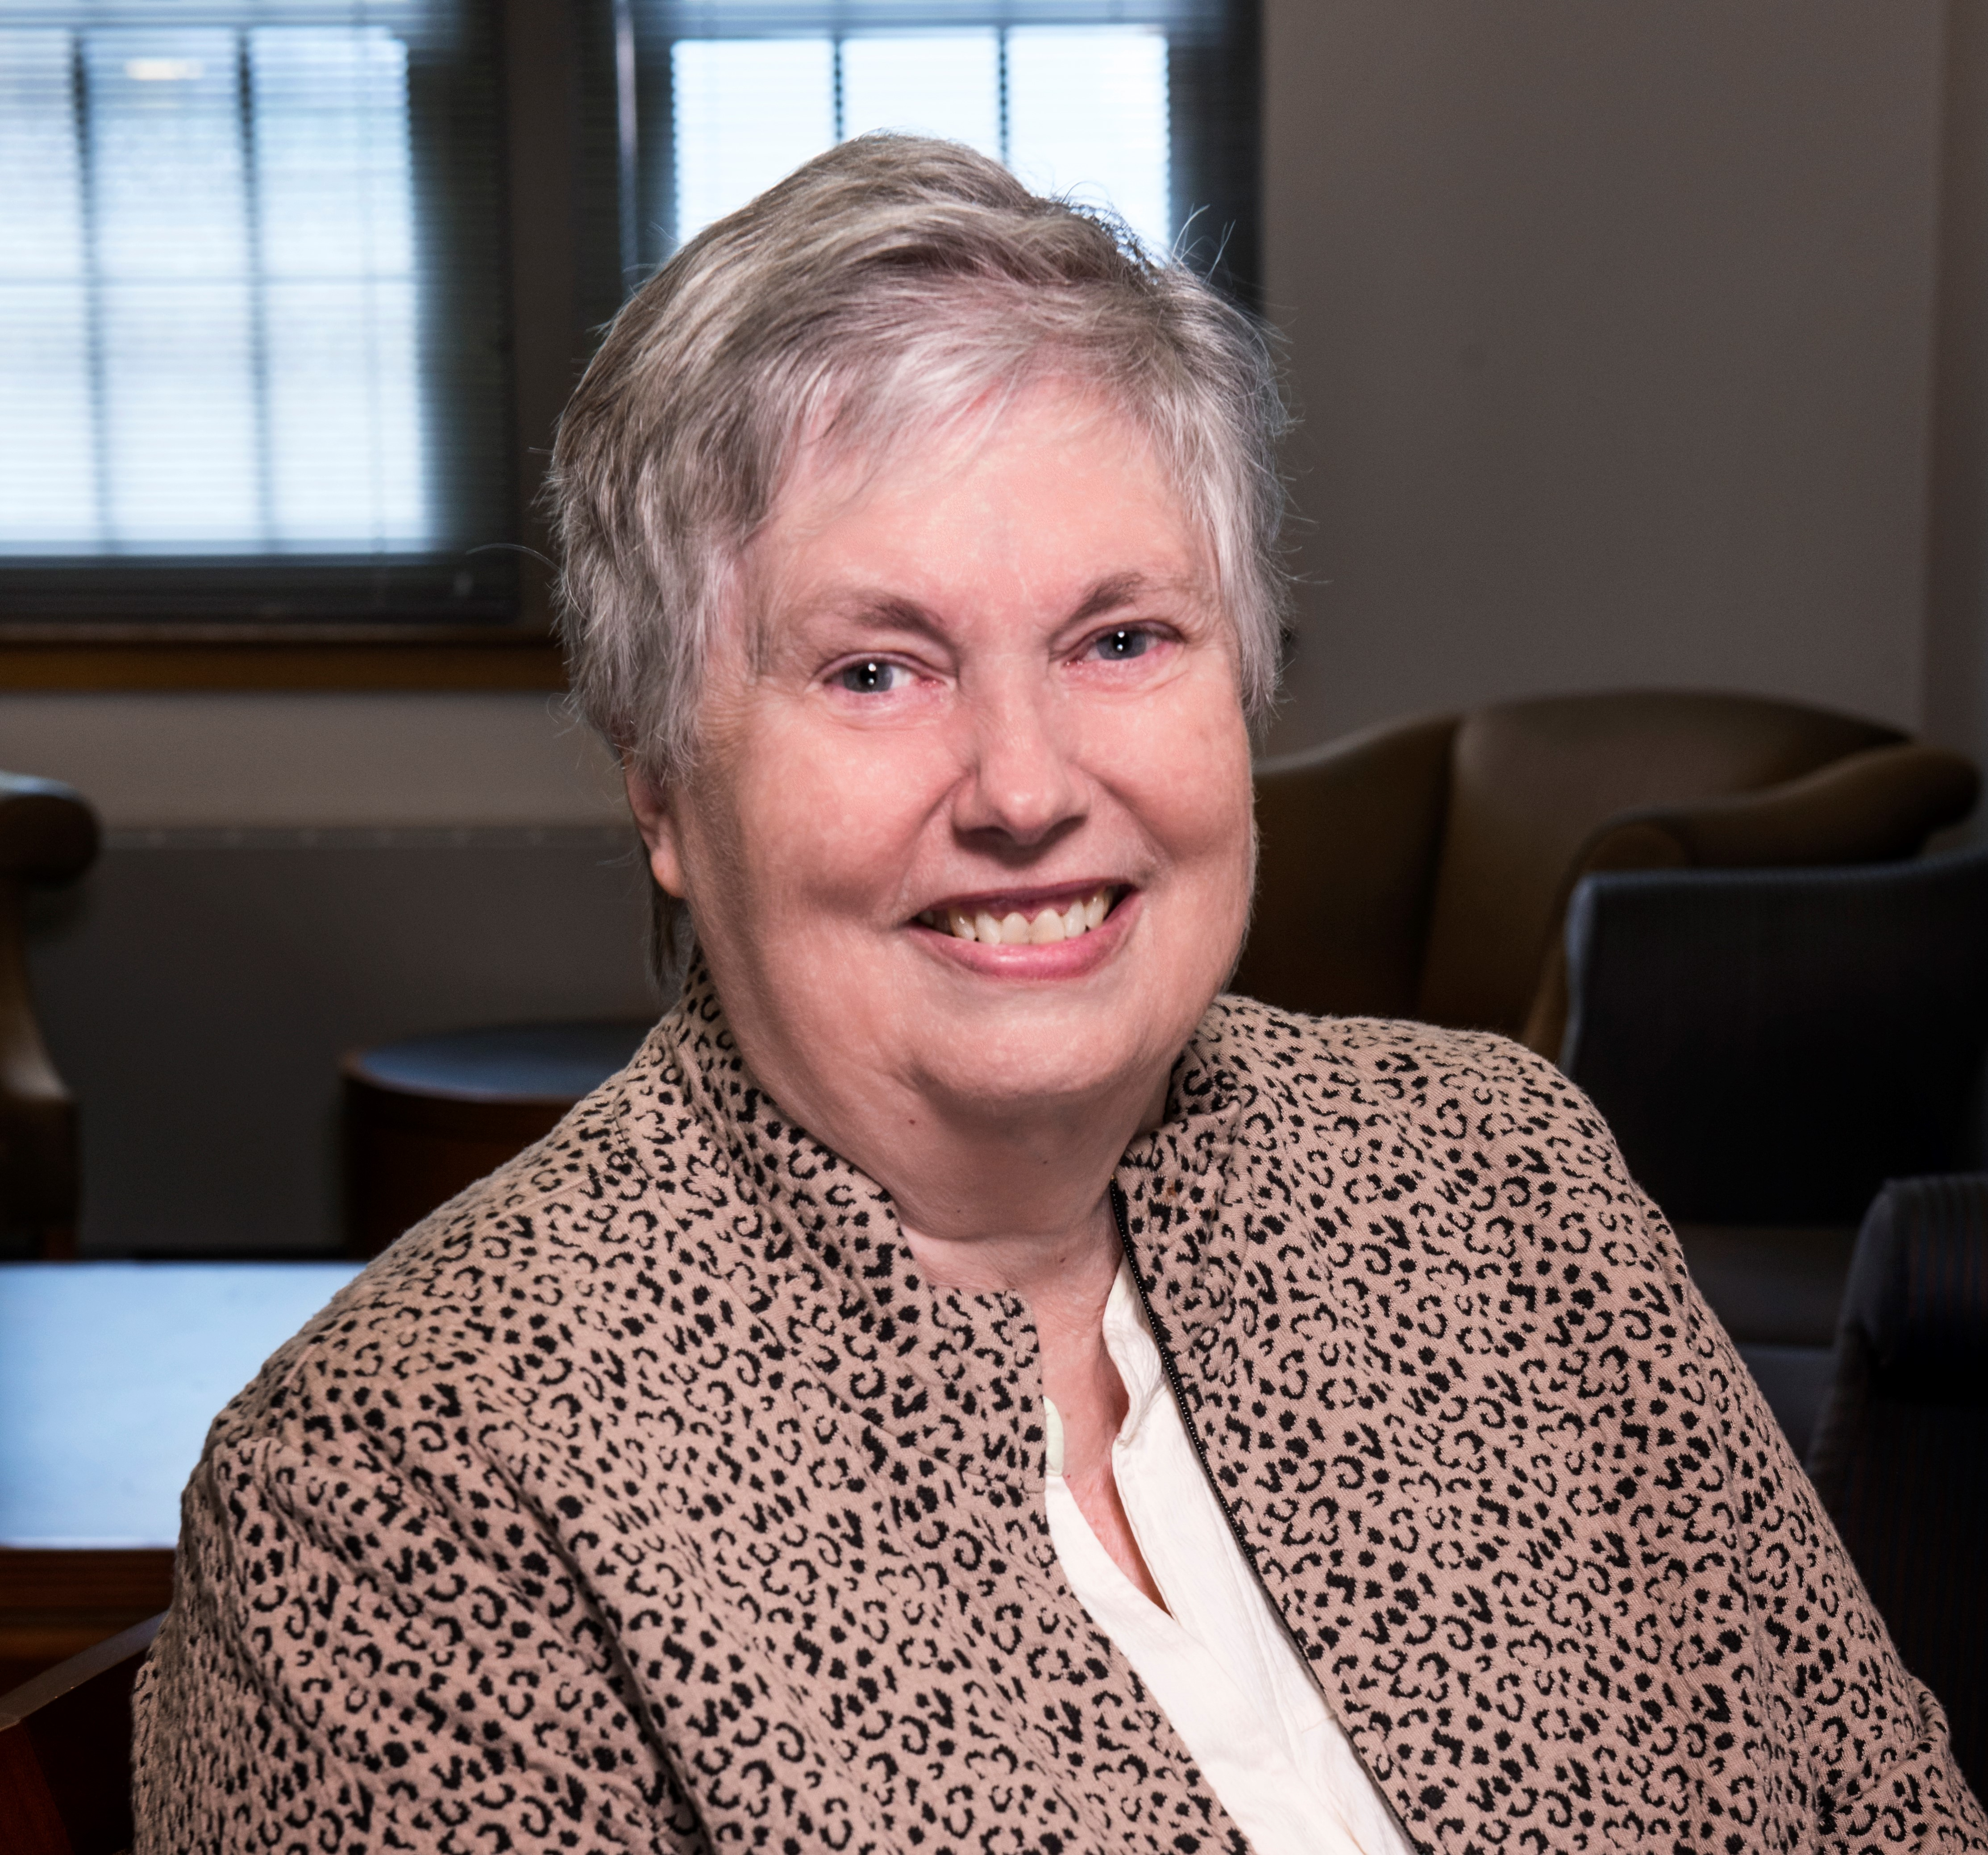 Professor Jean M Bartunek of Boston College